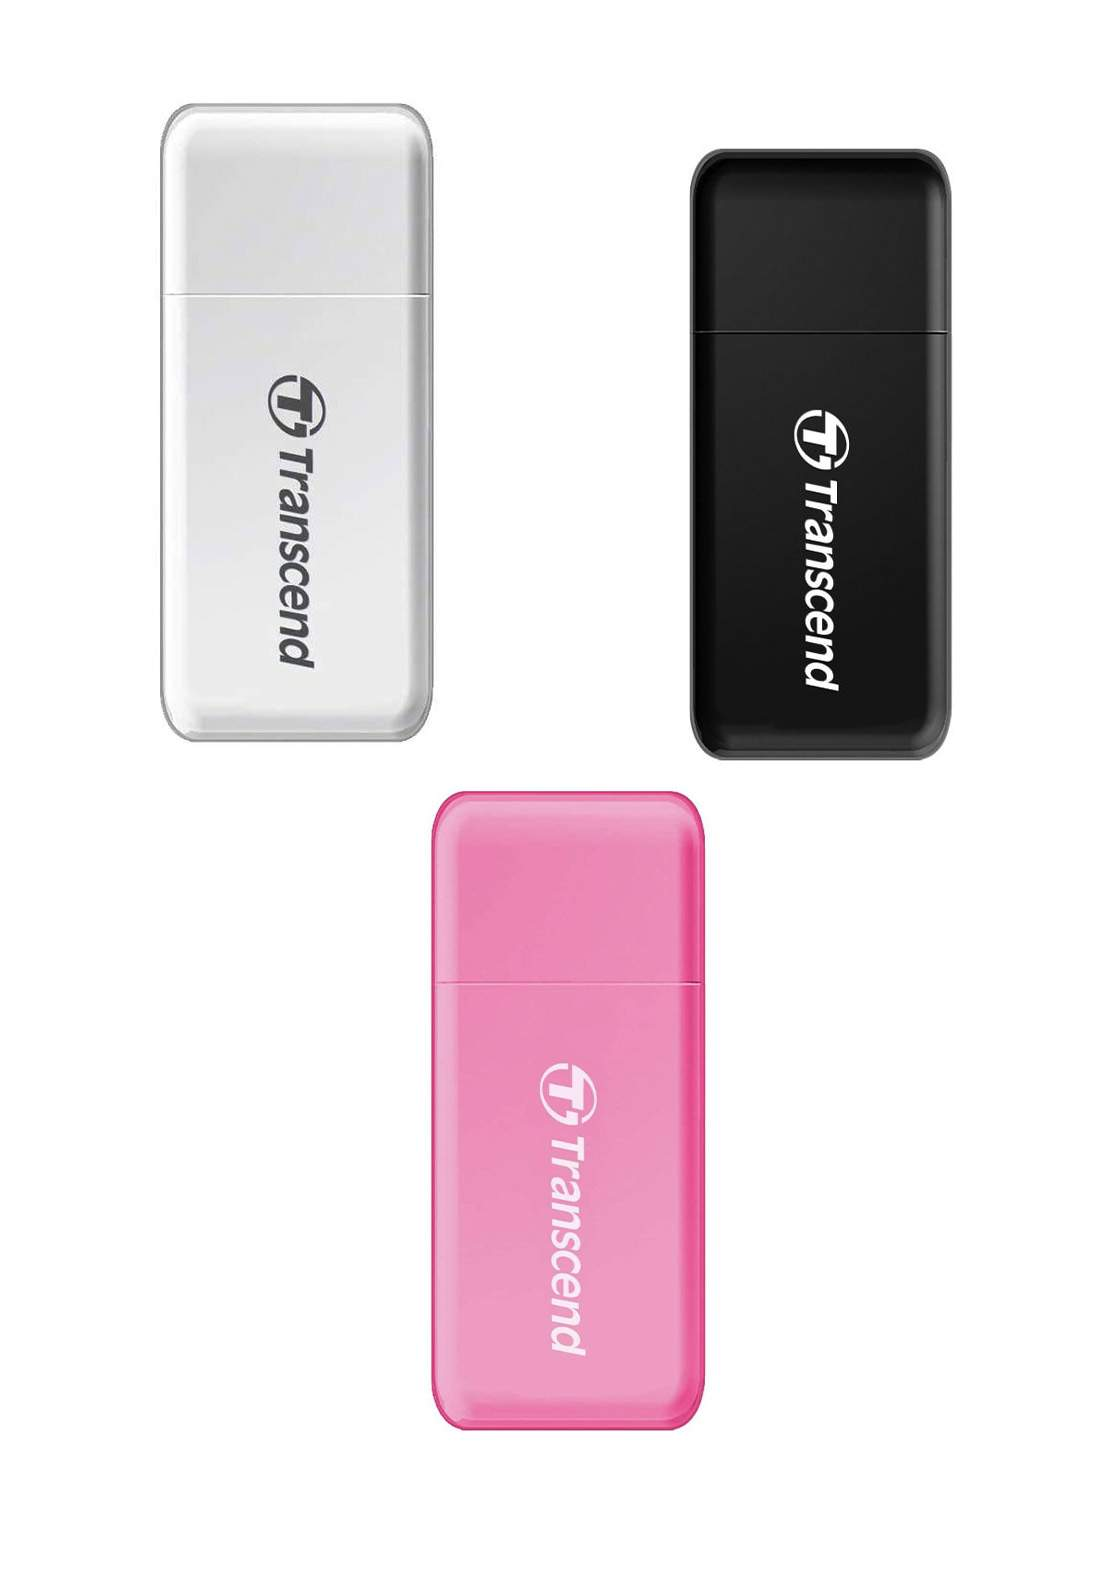 Transcend RDF5 USB 3.0 Memory Card Reader قارئ بطاقات الذاكرة